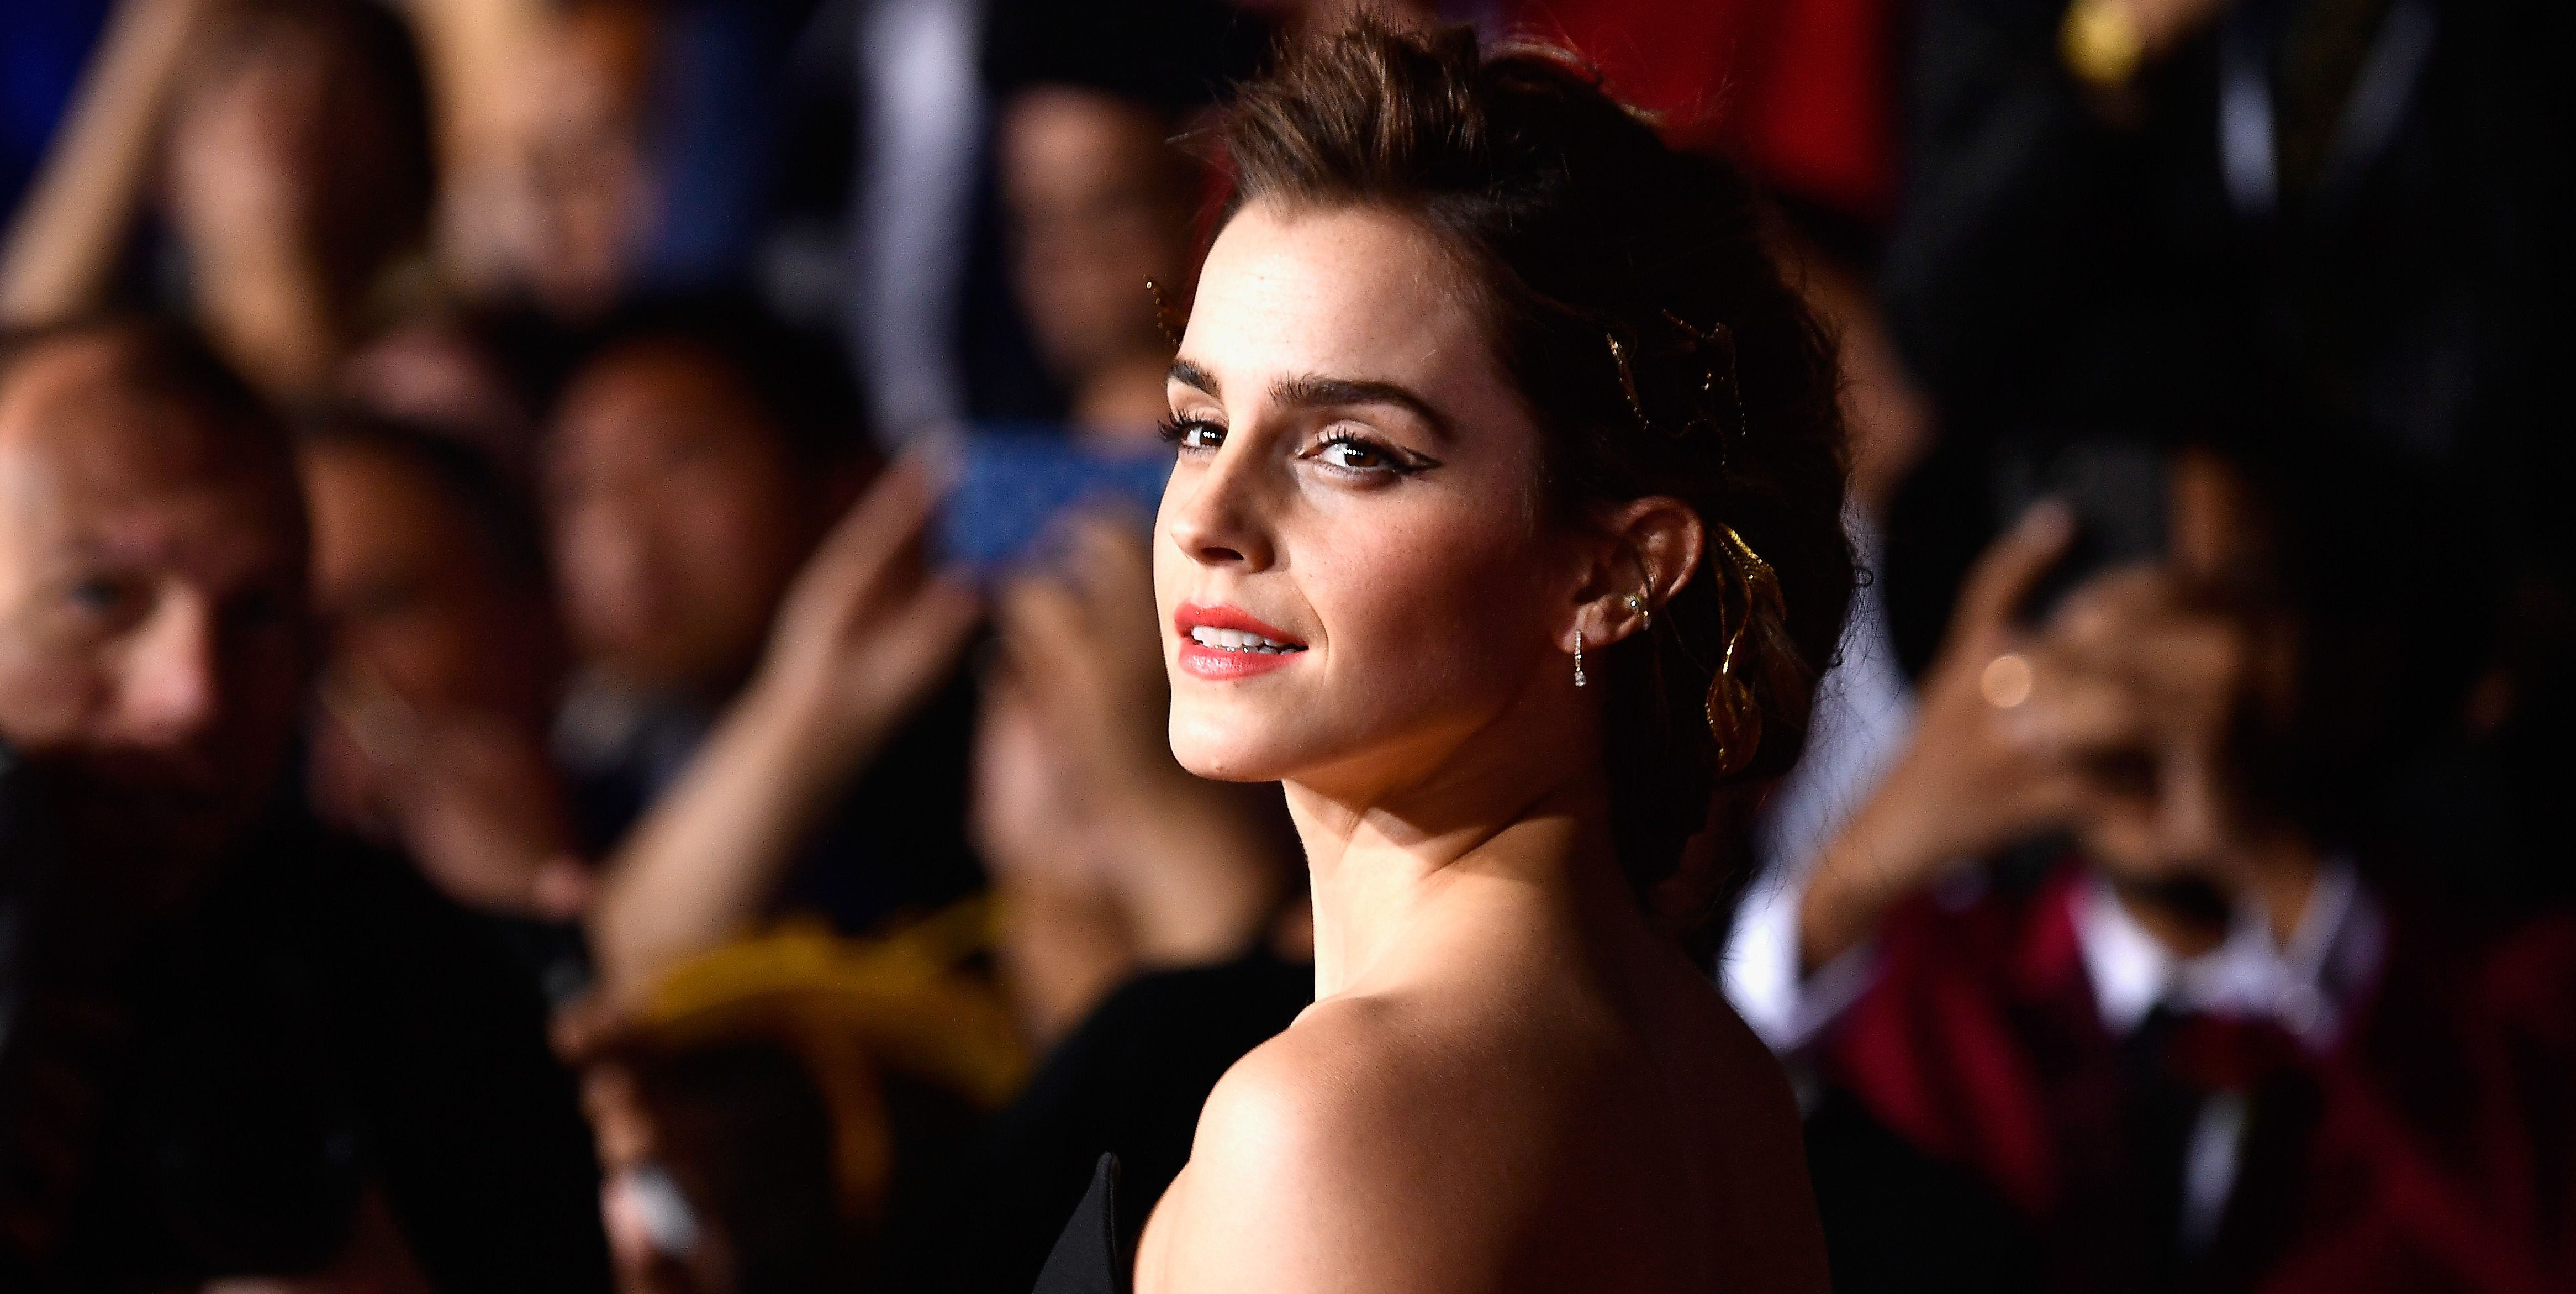 Emma Watson Shared the First Cast Photo from Greta Gerwig's Little Women